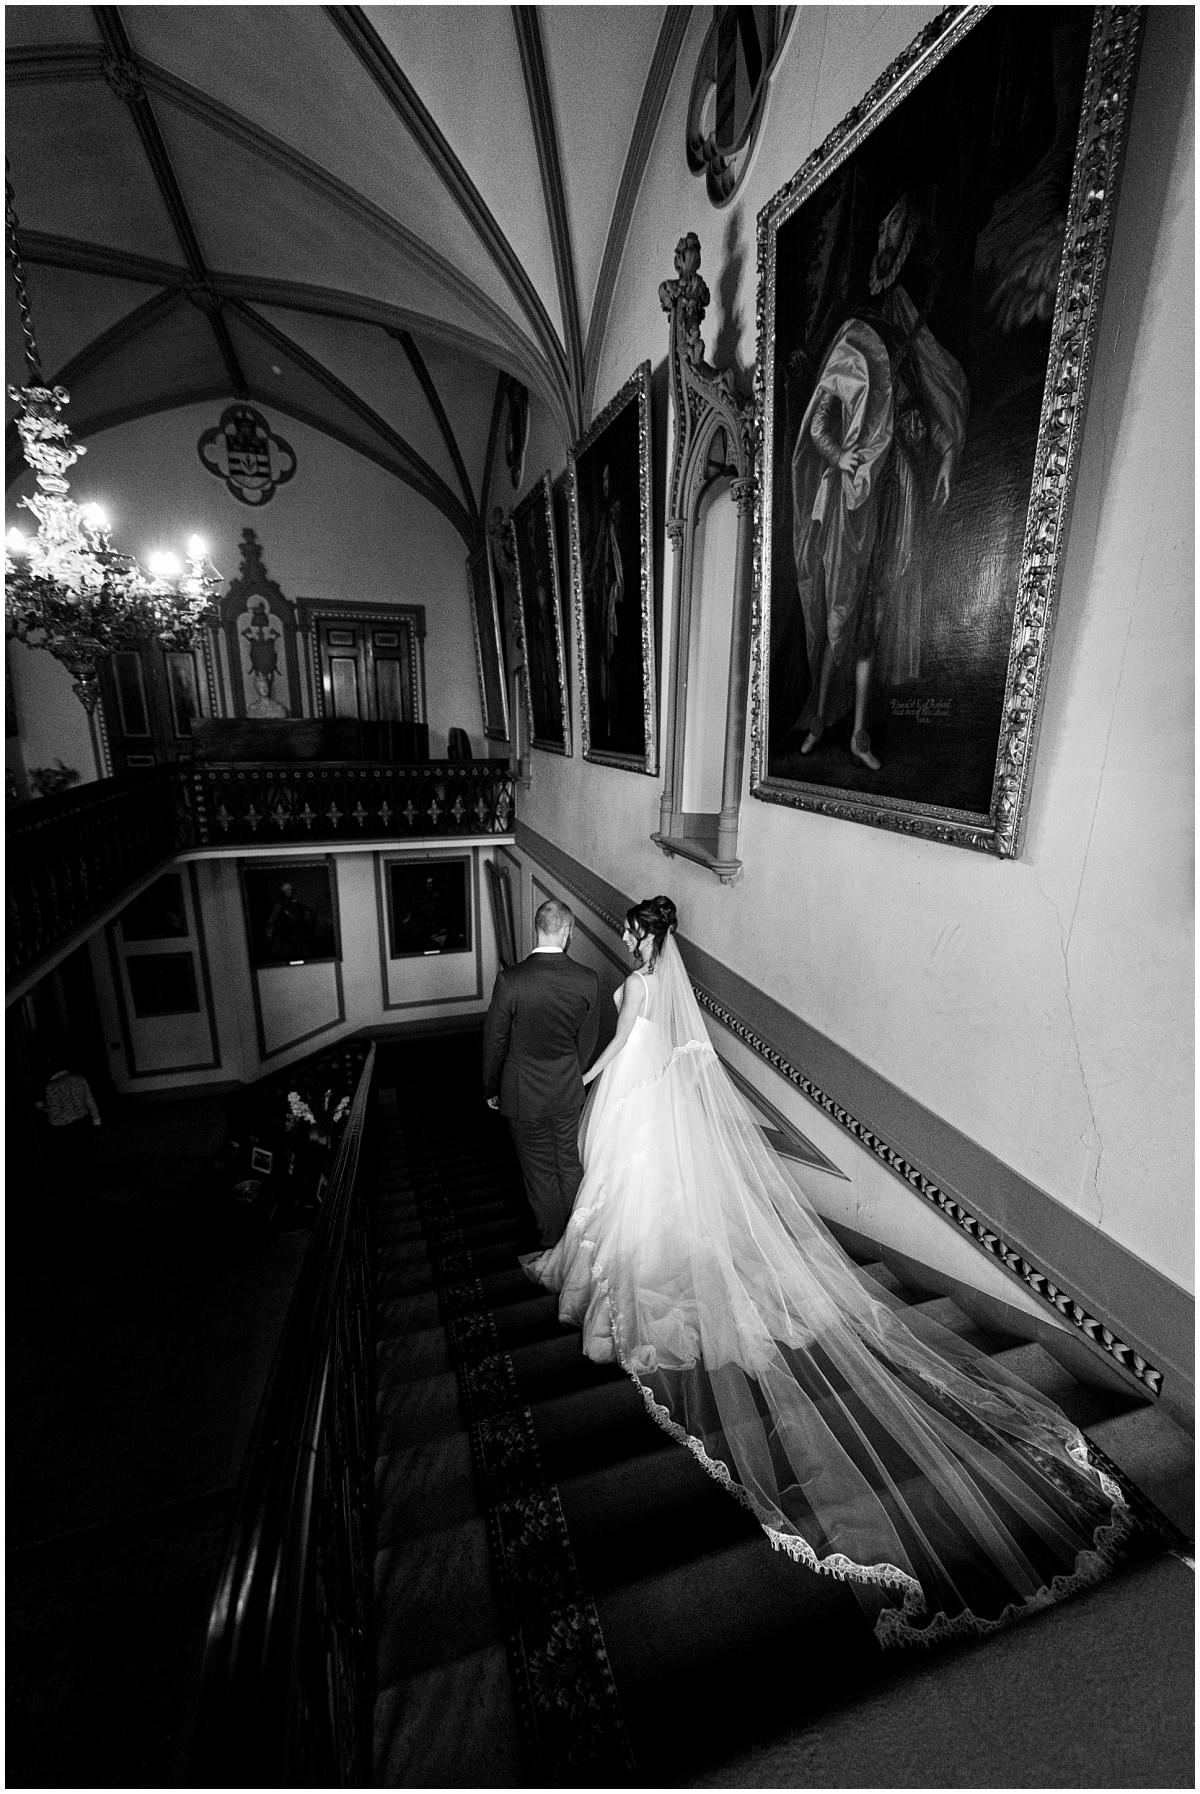 Belvoir Castle Wedding - staircase